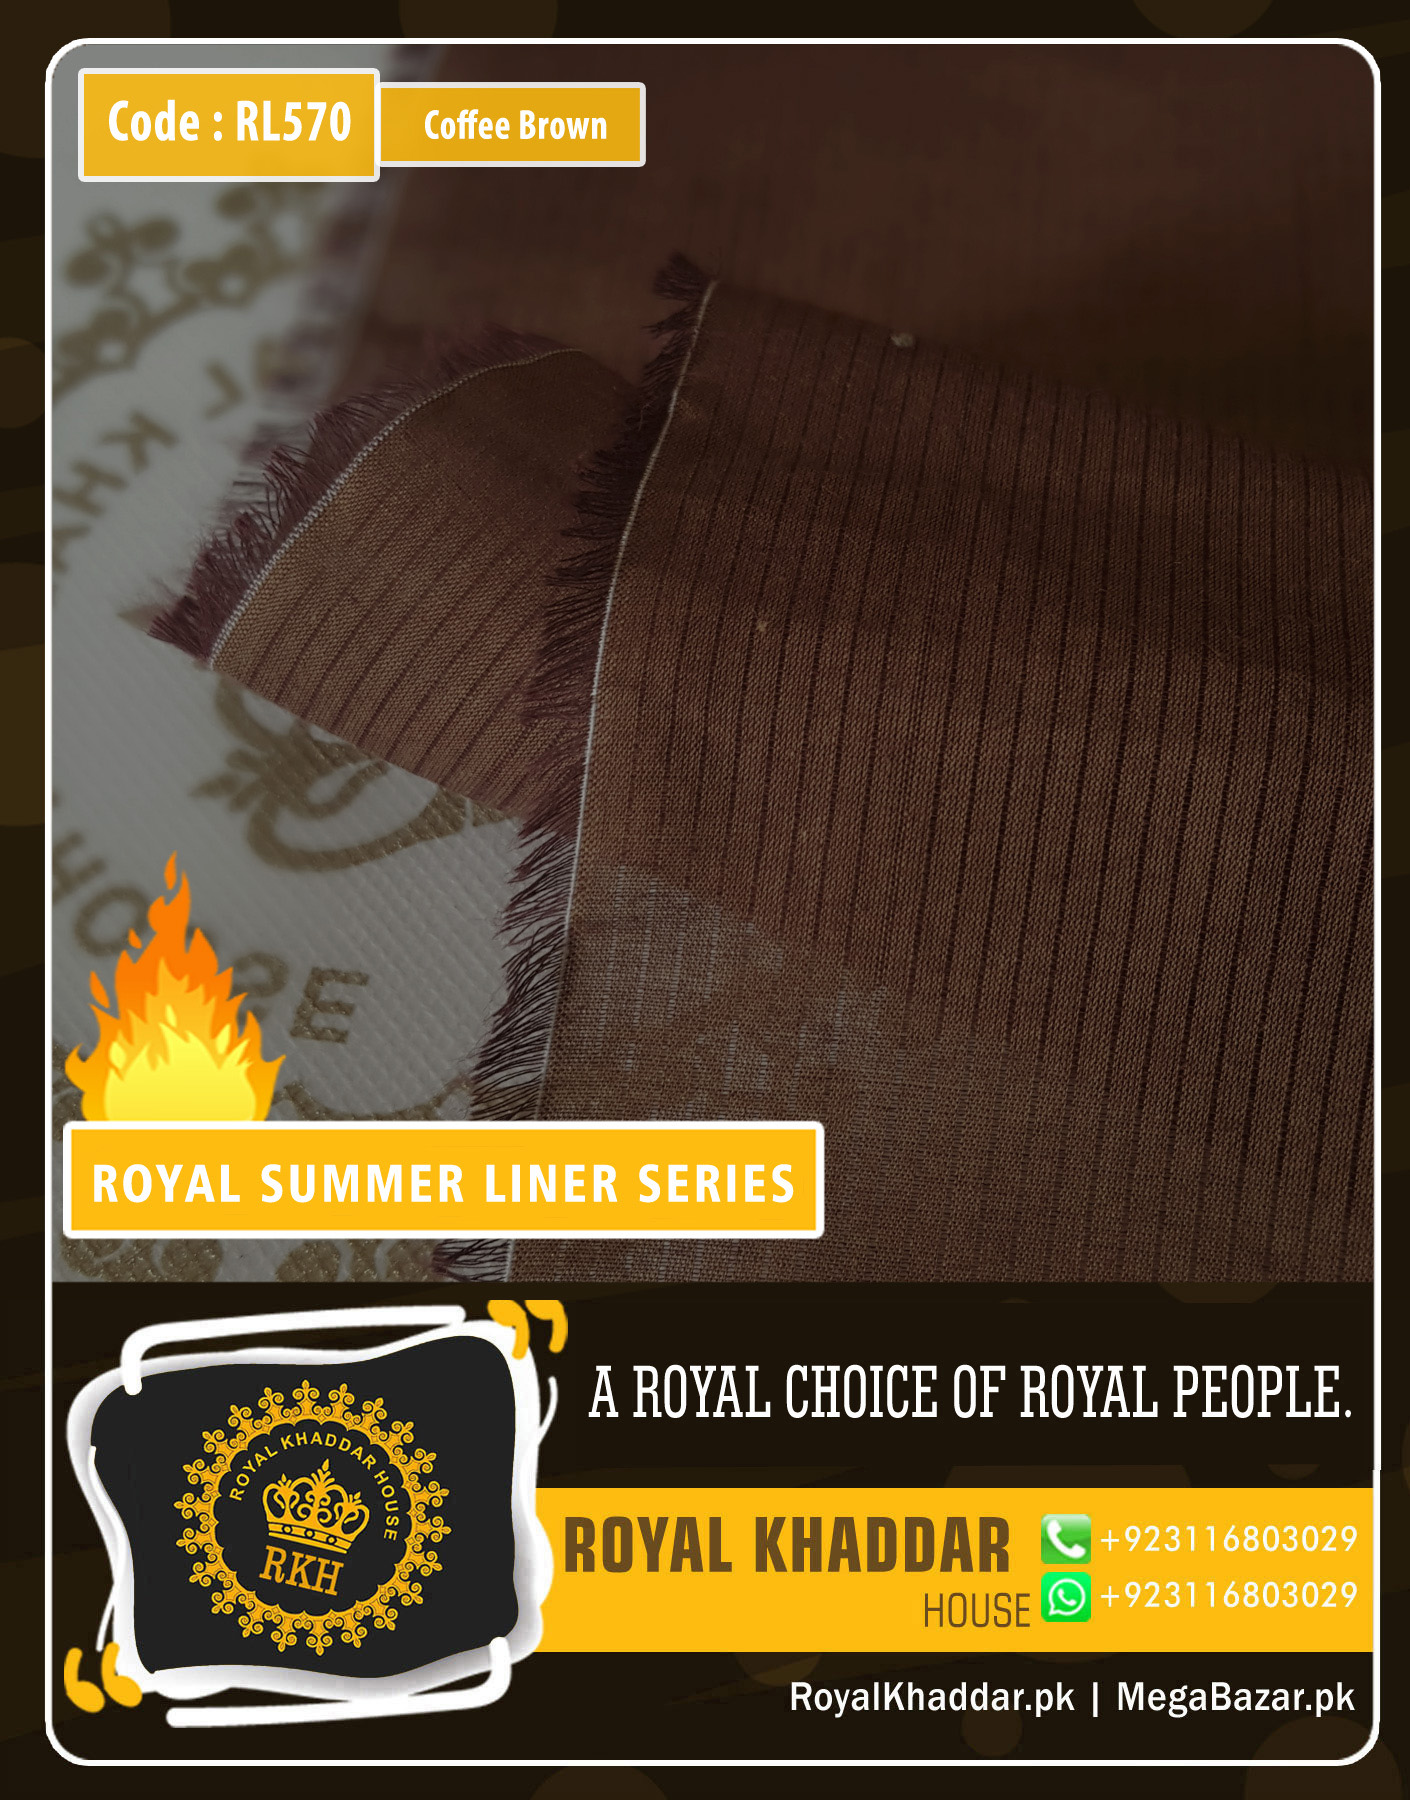 Coffee Brown Summer Liner Khaddar RL570